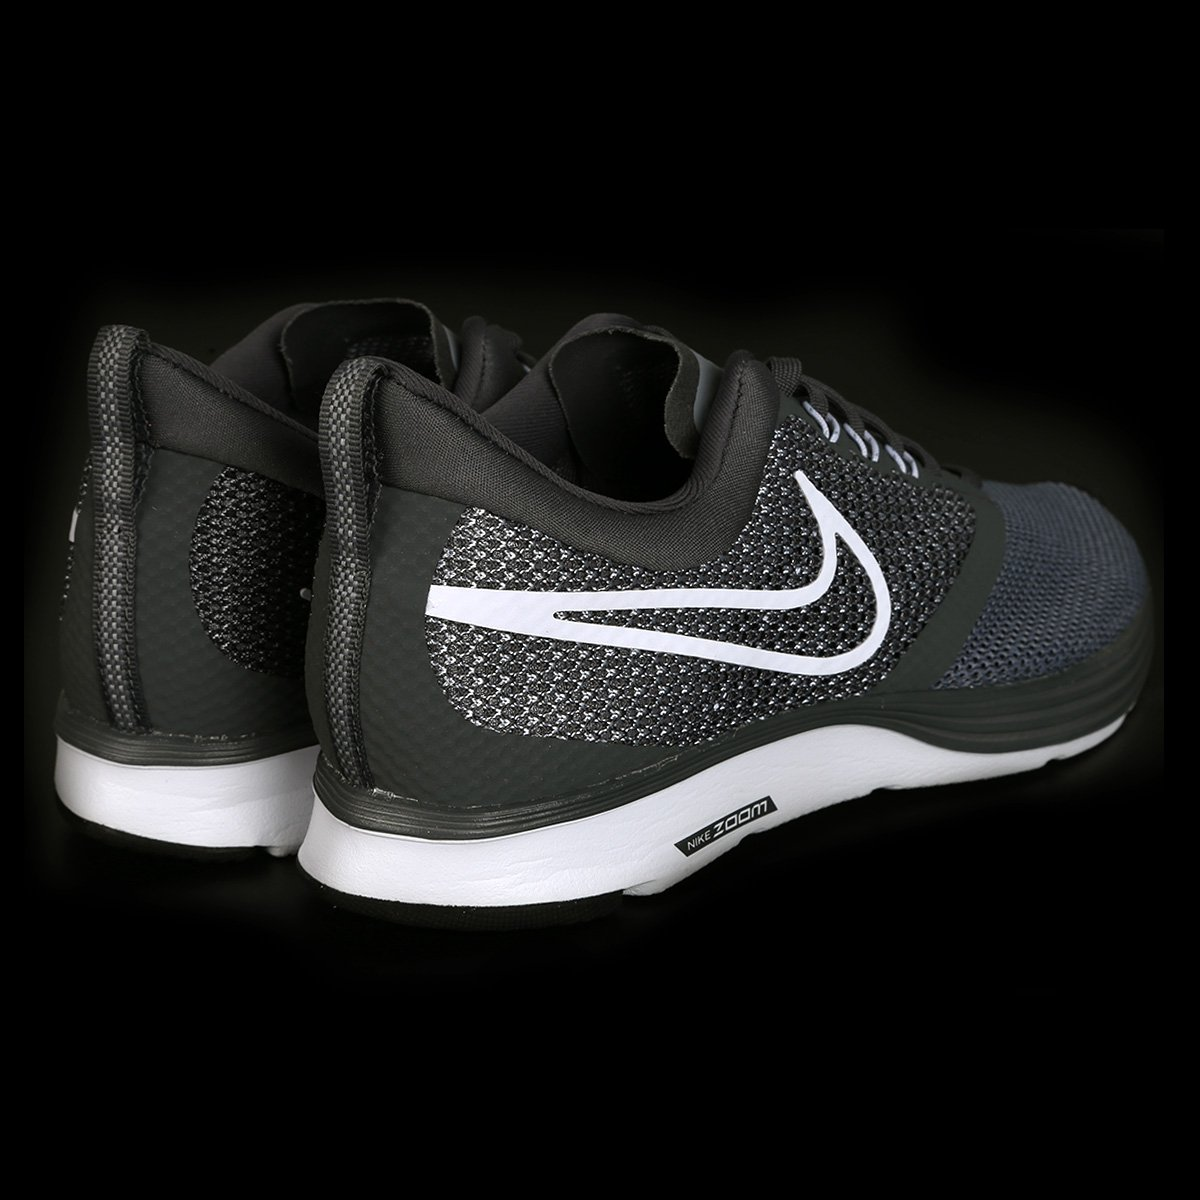 Tênis Nike Zoom Strike Masculino - Cinza e Branco - Compre Agora ... 5406ef2bac514